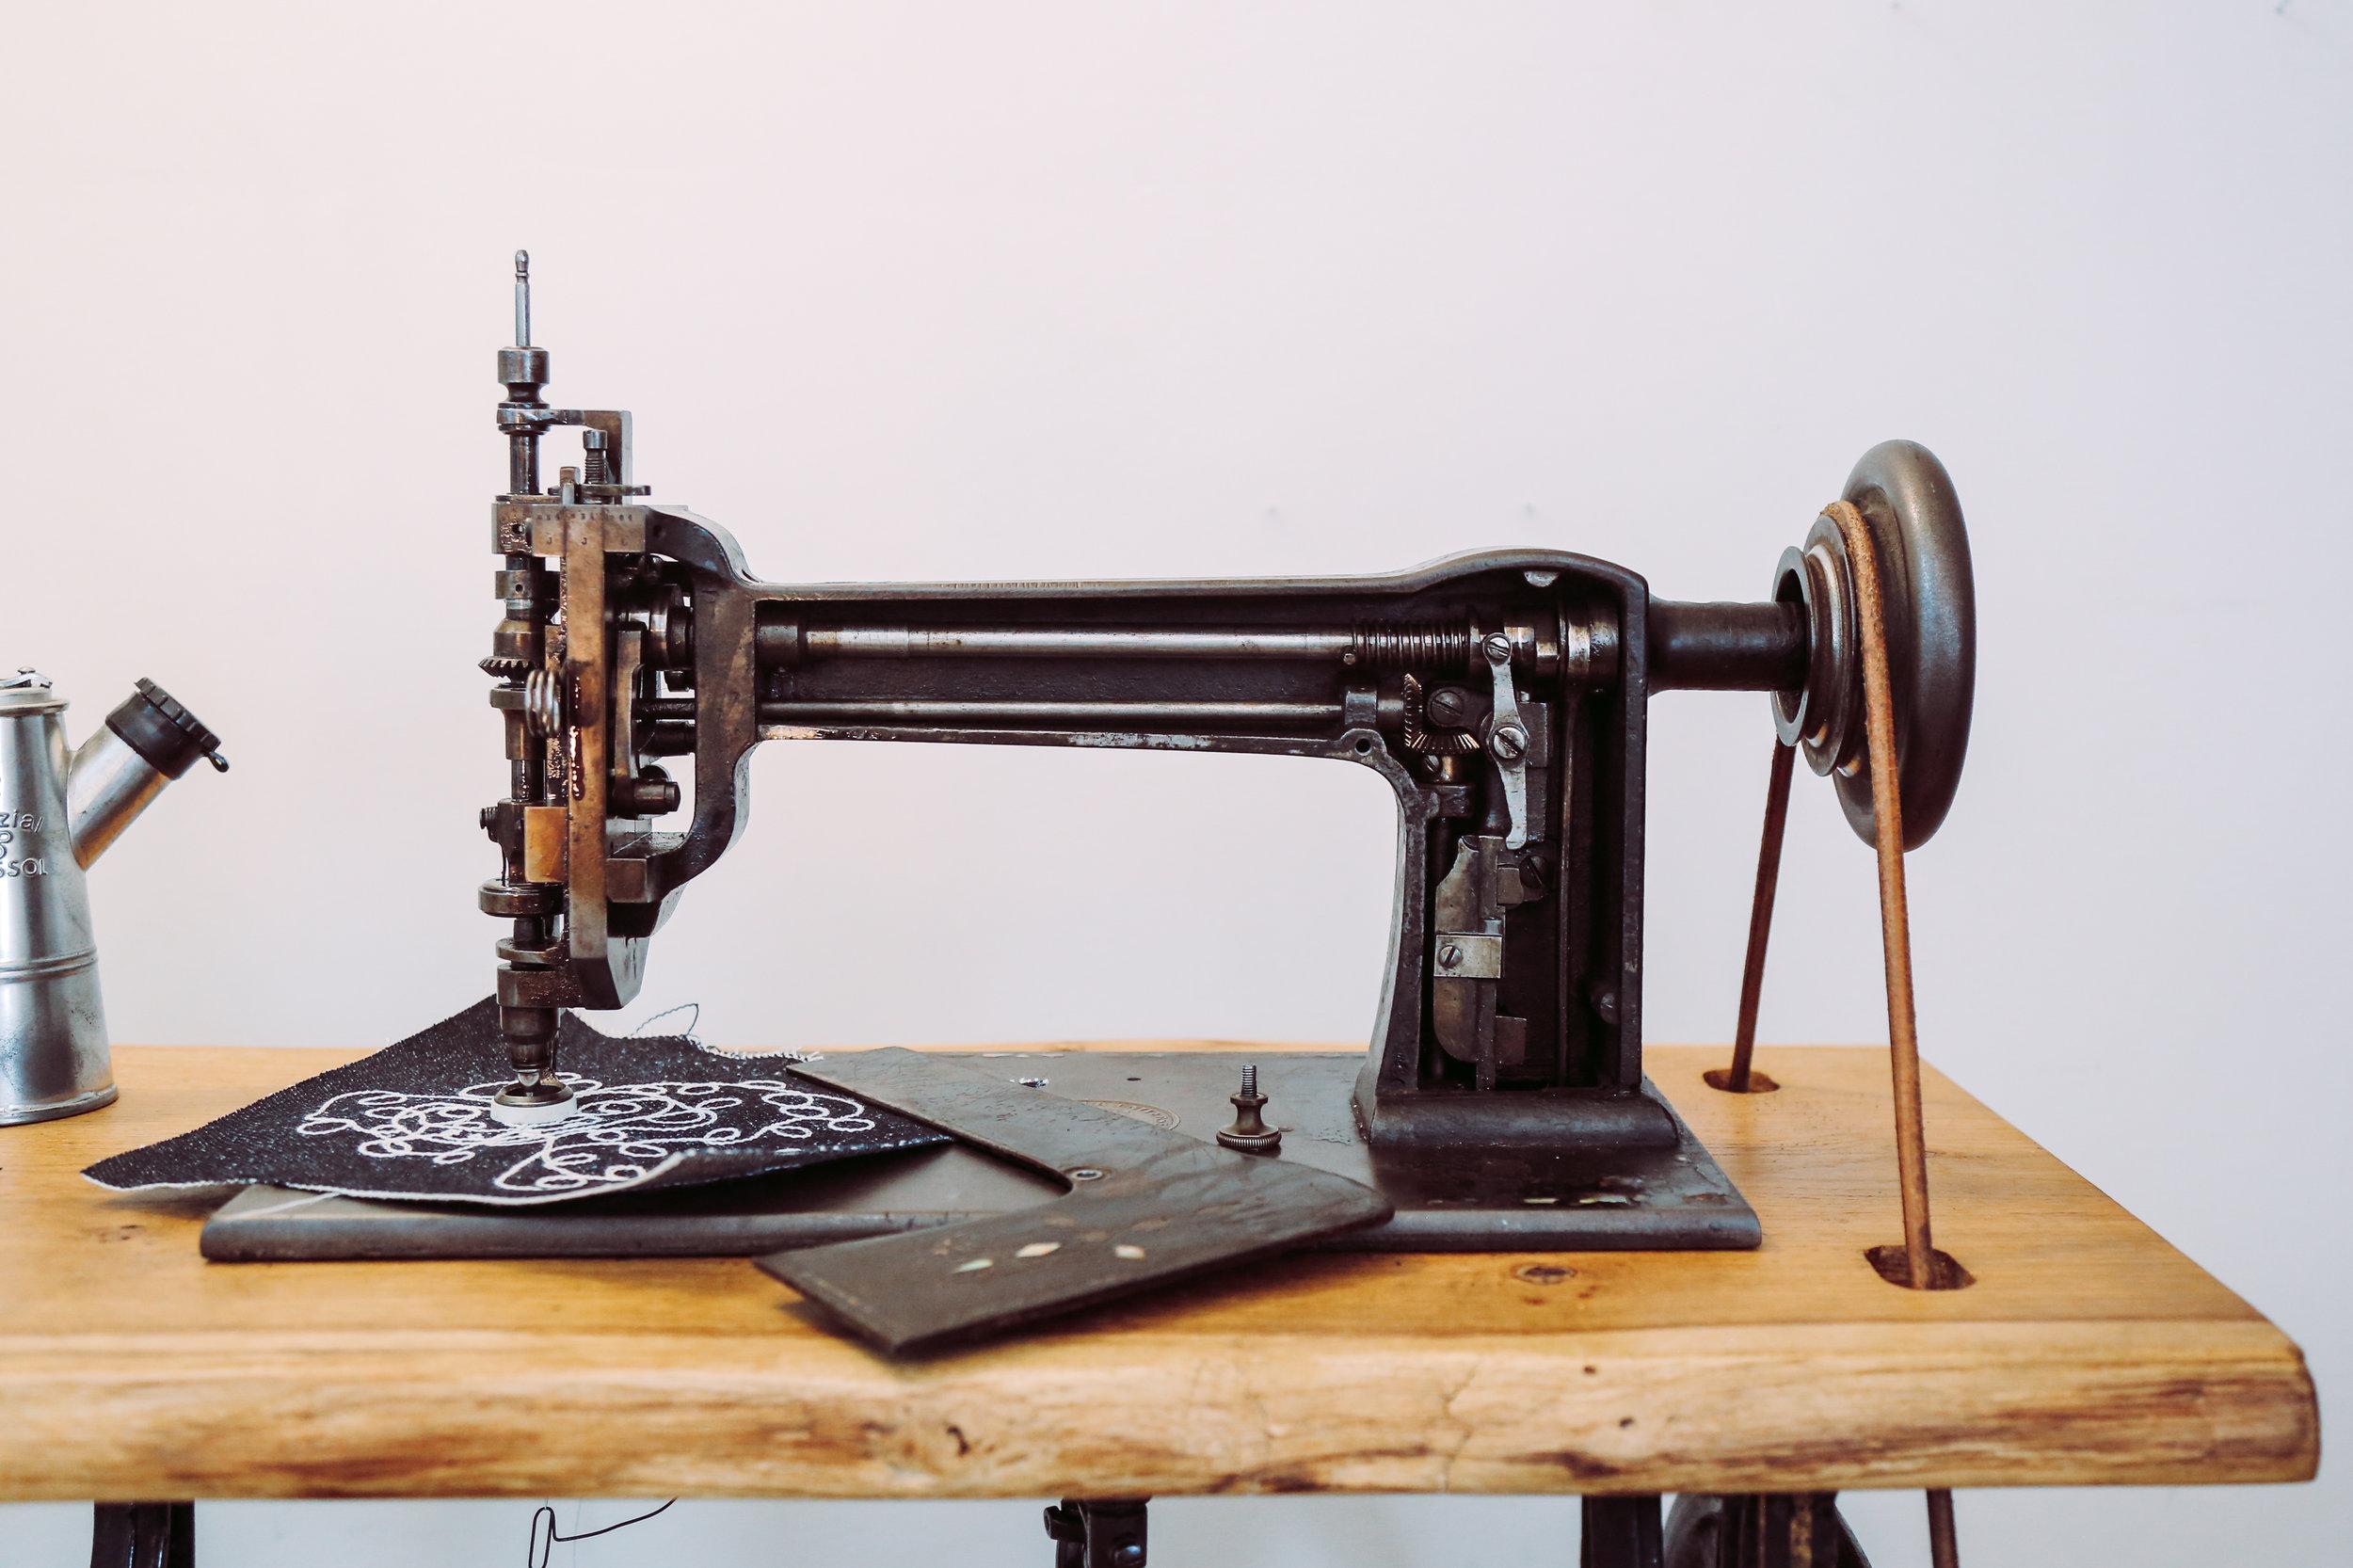 Cornely A Chainstitch Machine Saintchains Artisan Embroidery.jpg